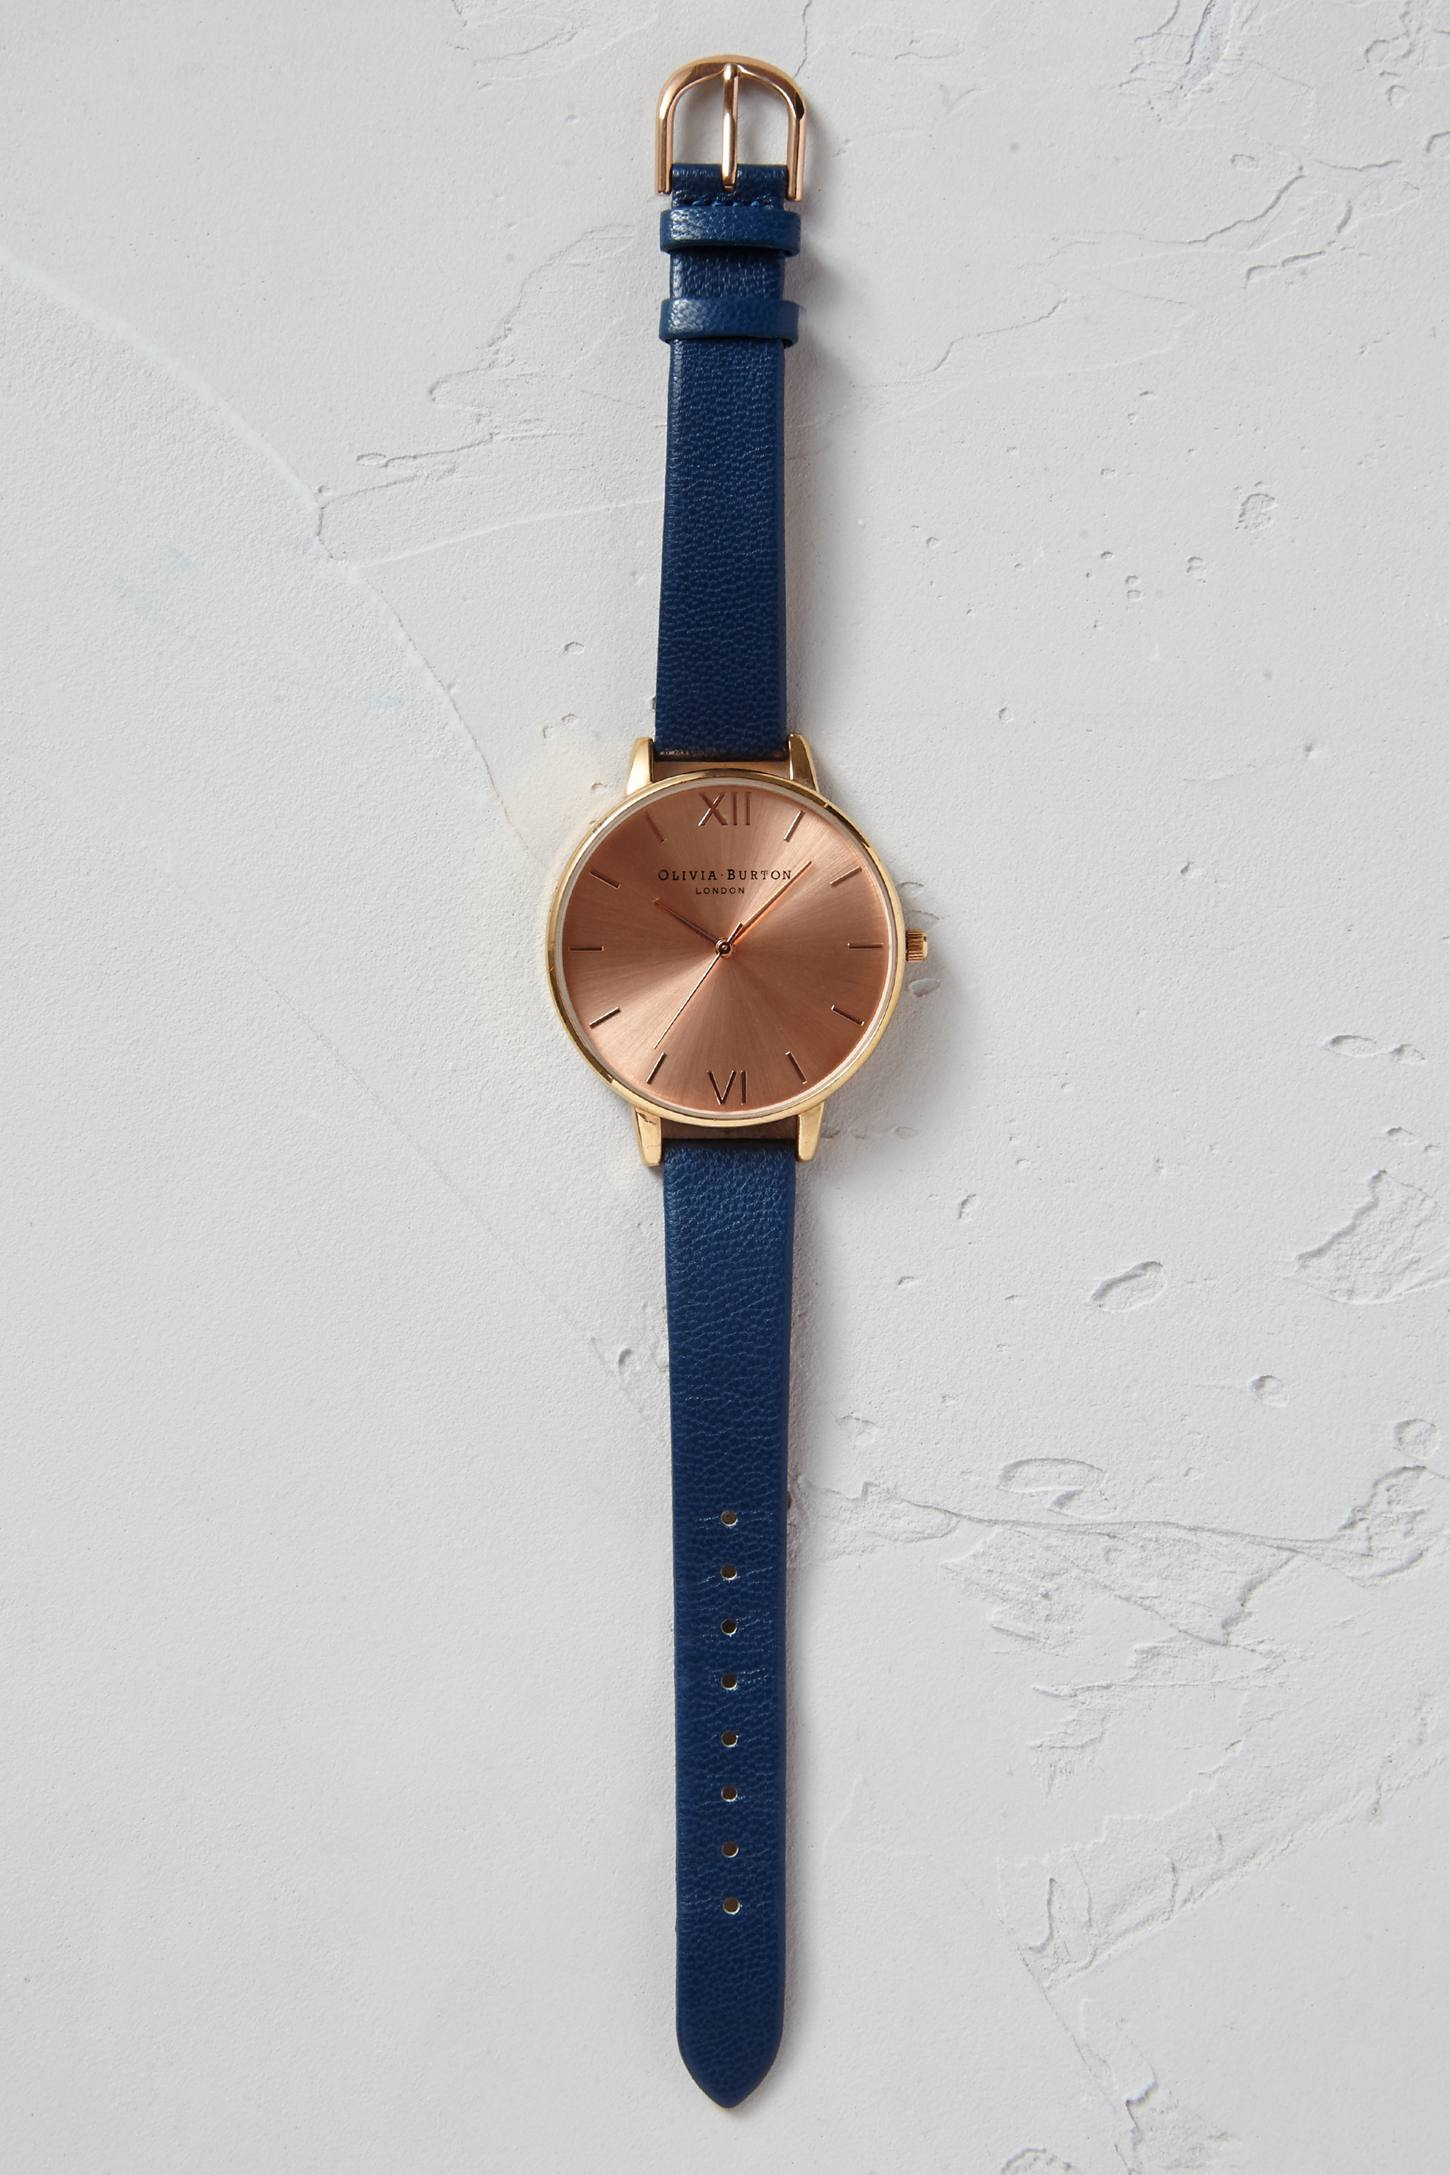 Olivia Burton Sunbeam Watch